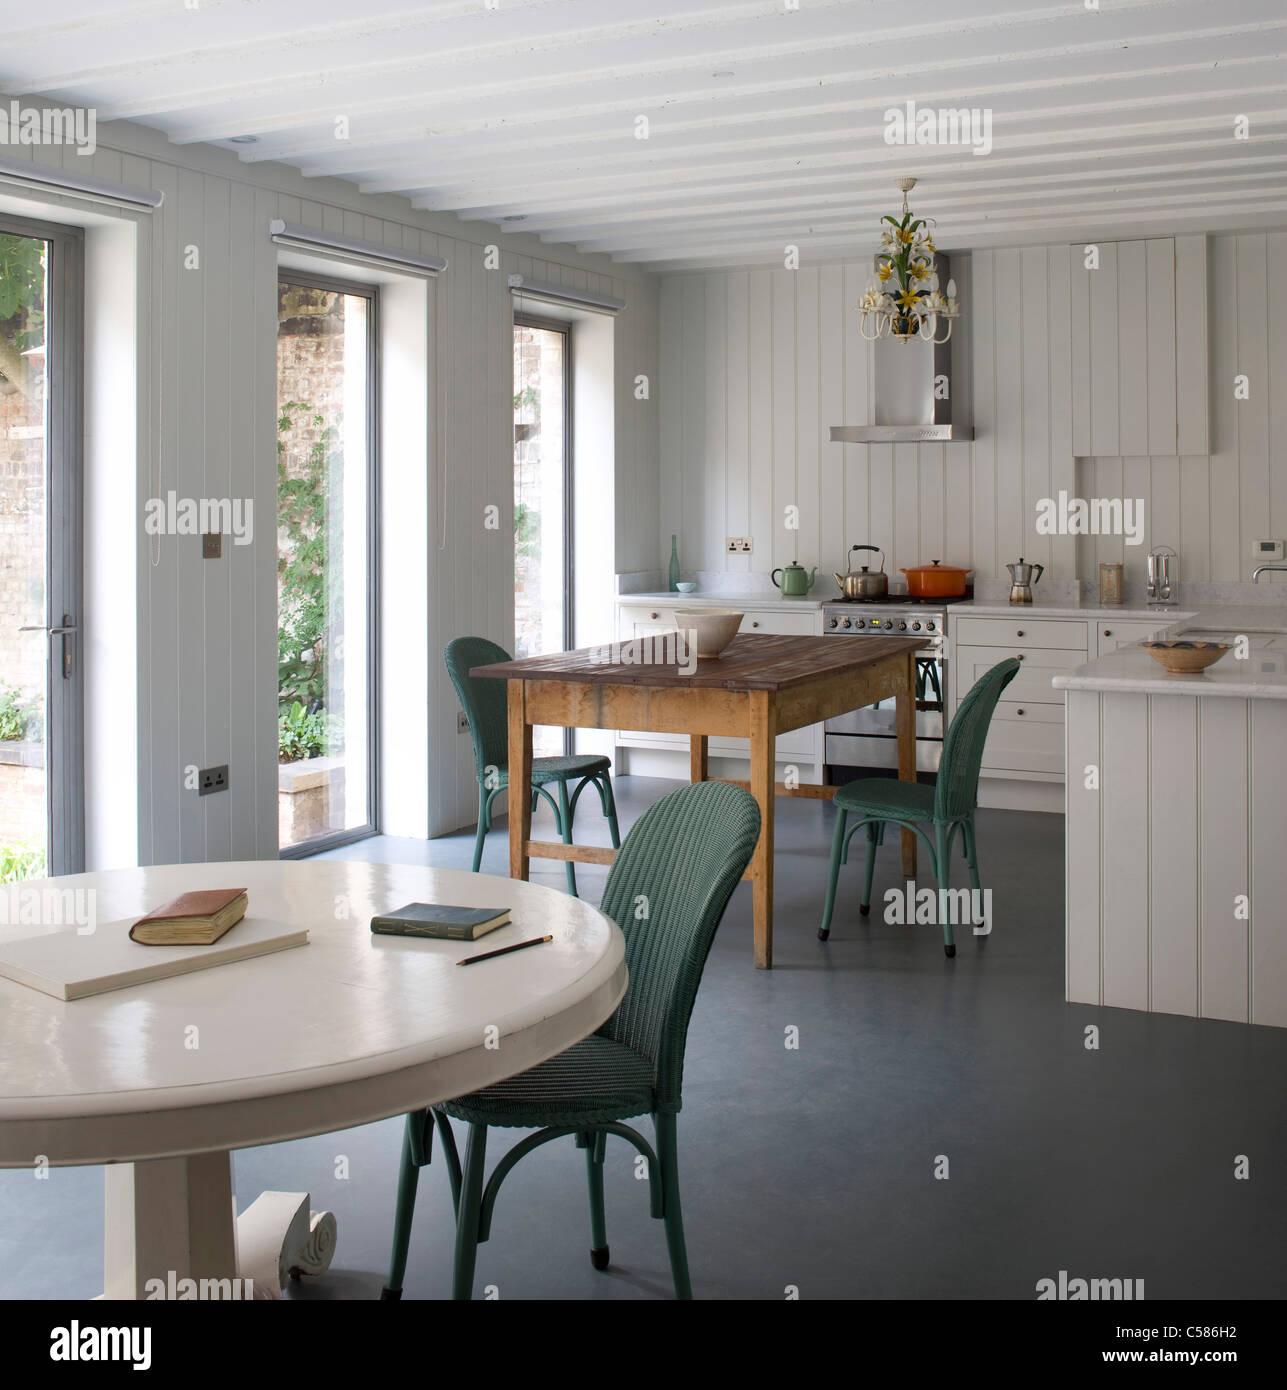 Cucine Contemporanee Immagini & Cucine Contemporanee Fotos Stock - Alamy